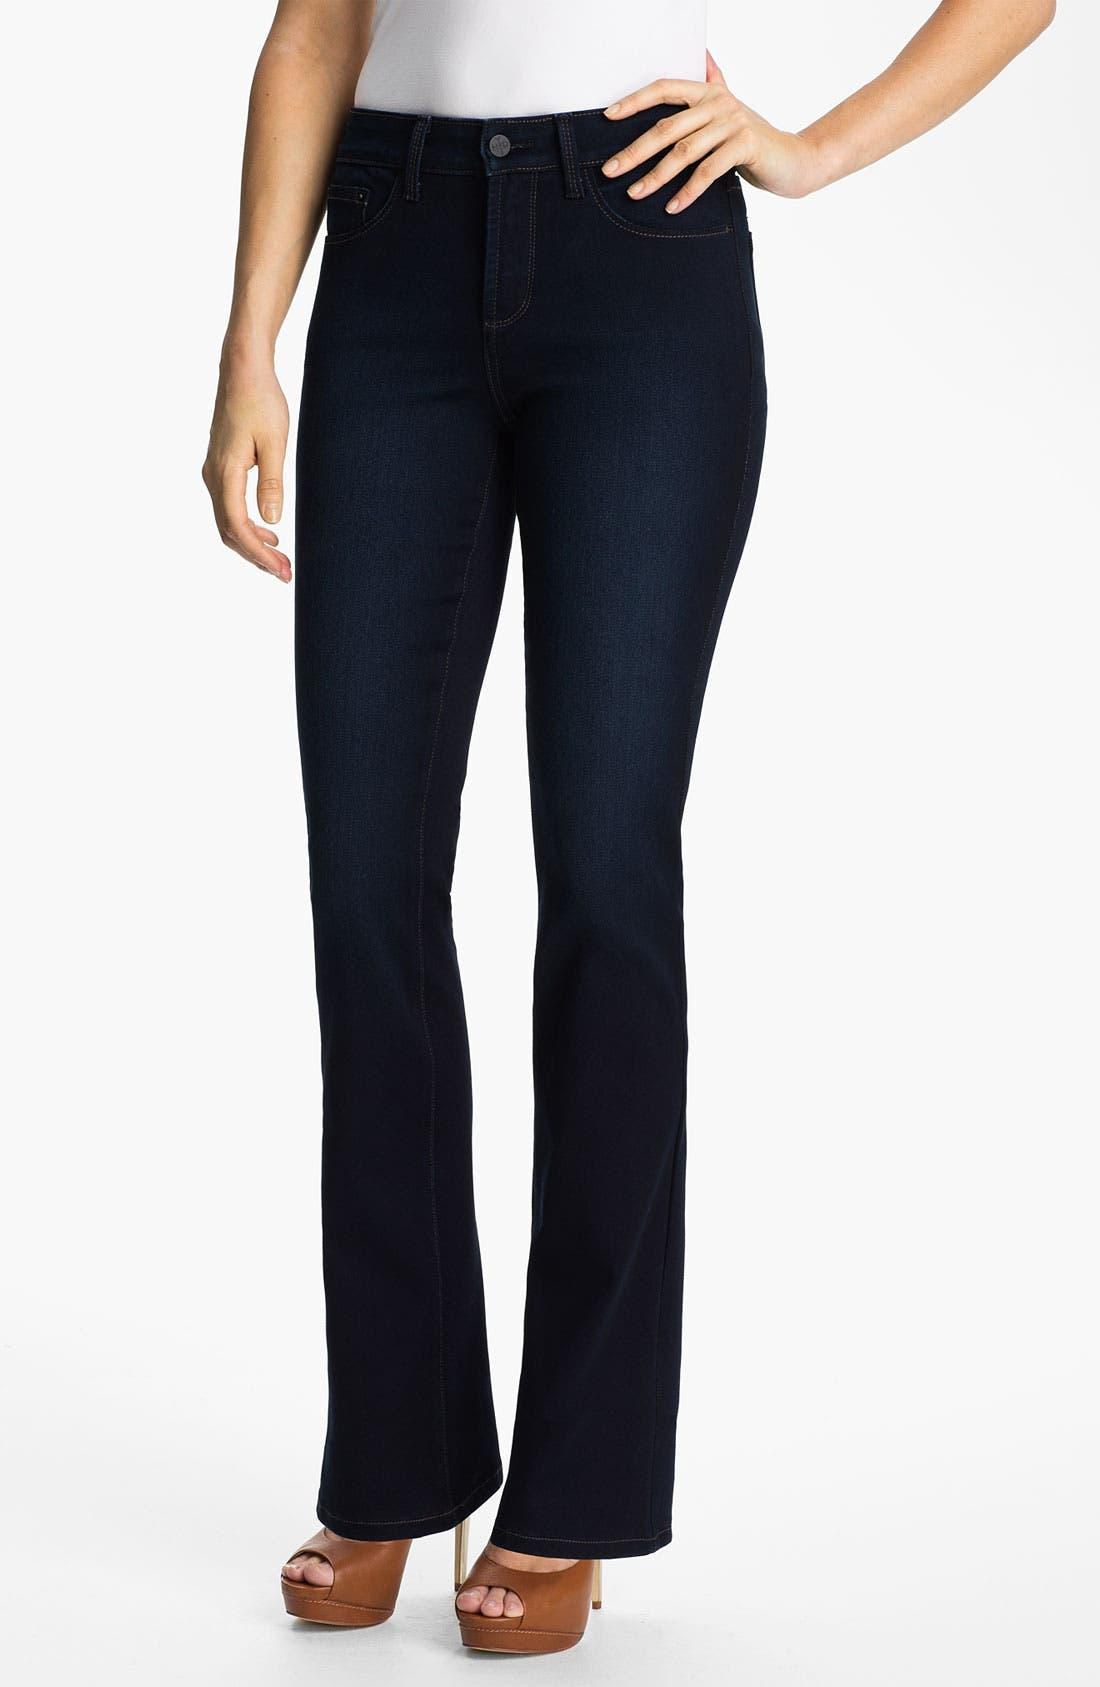 Main Image - NYDJ 'Barbara' Bootcut Jeans (Long)